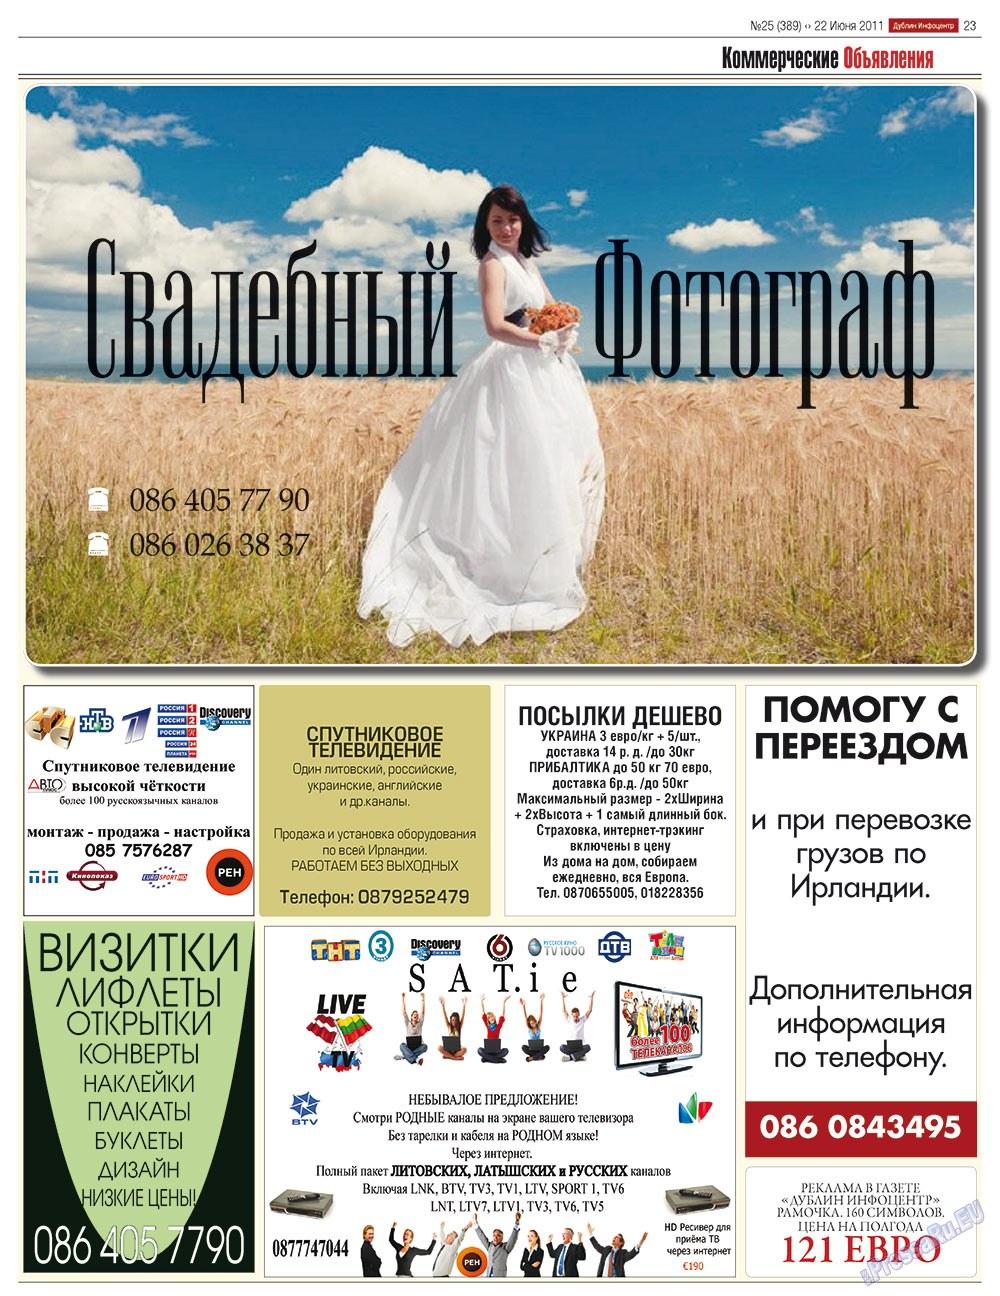 Дублин инфоцентр (газета). 2011 год, номер 25, стр. 23